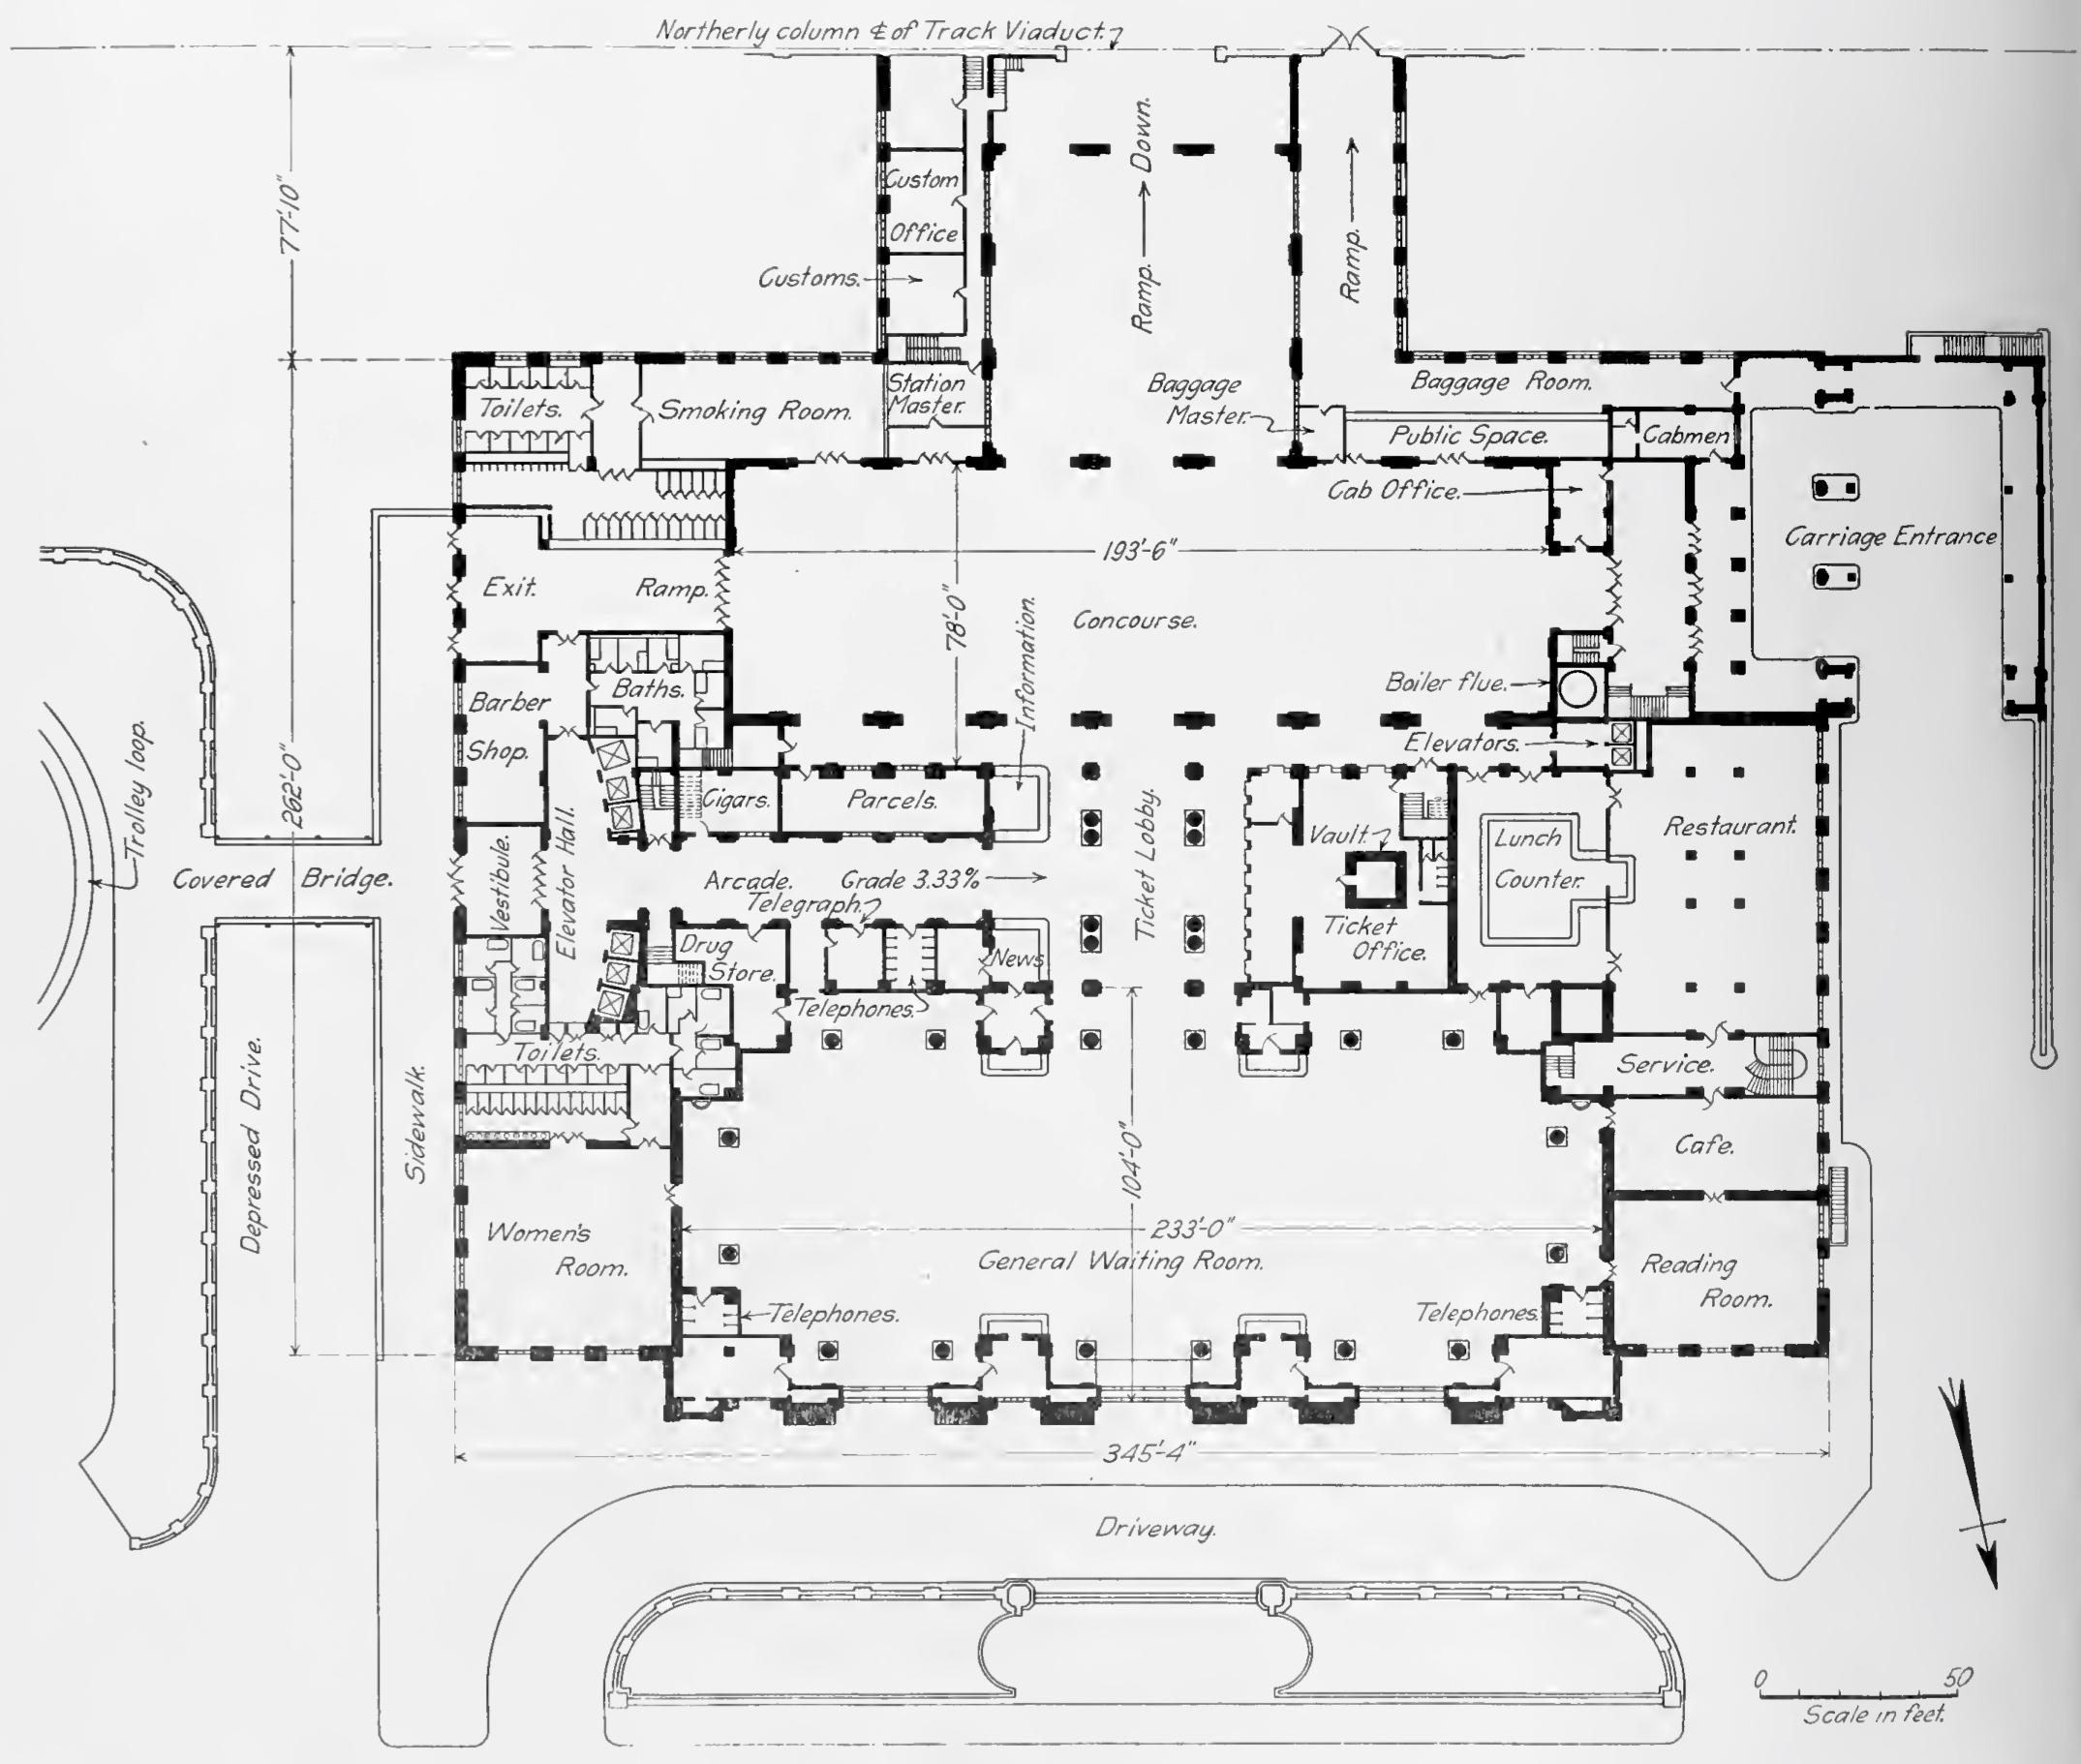 Marvelous Open Floor Plan Viewer Part - 6: File:Michigan Central Station Detroit Floor Plan.jpg